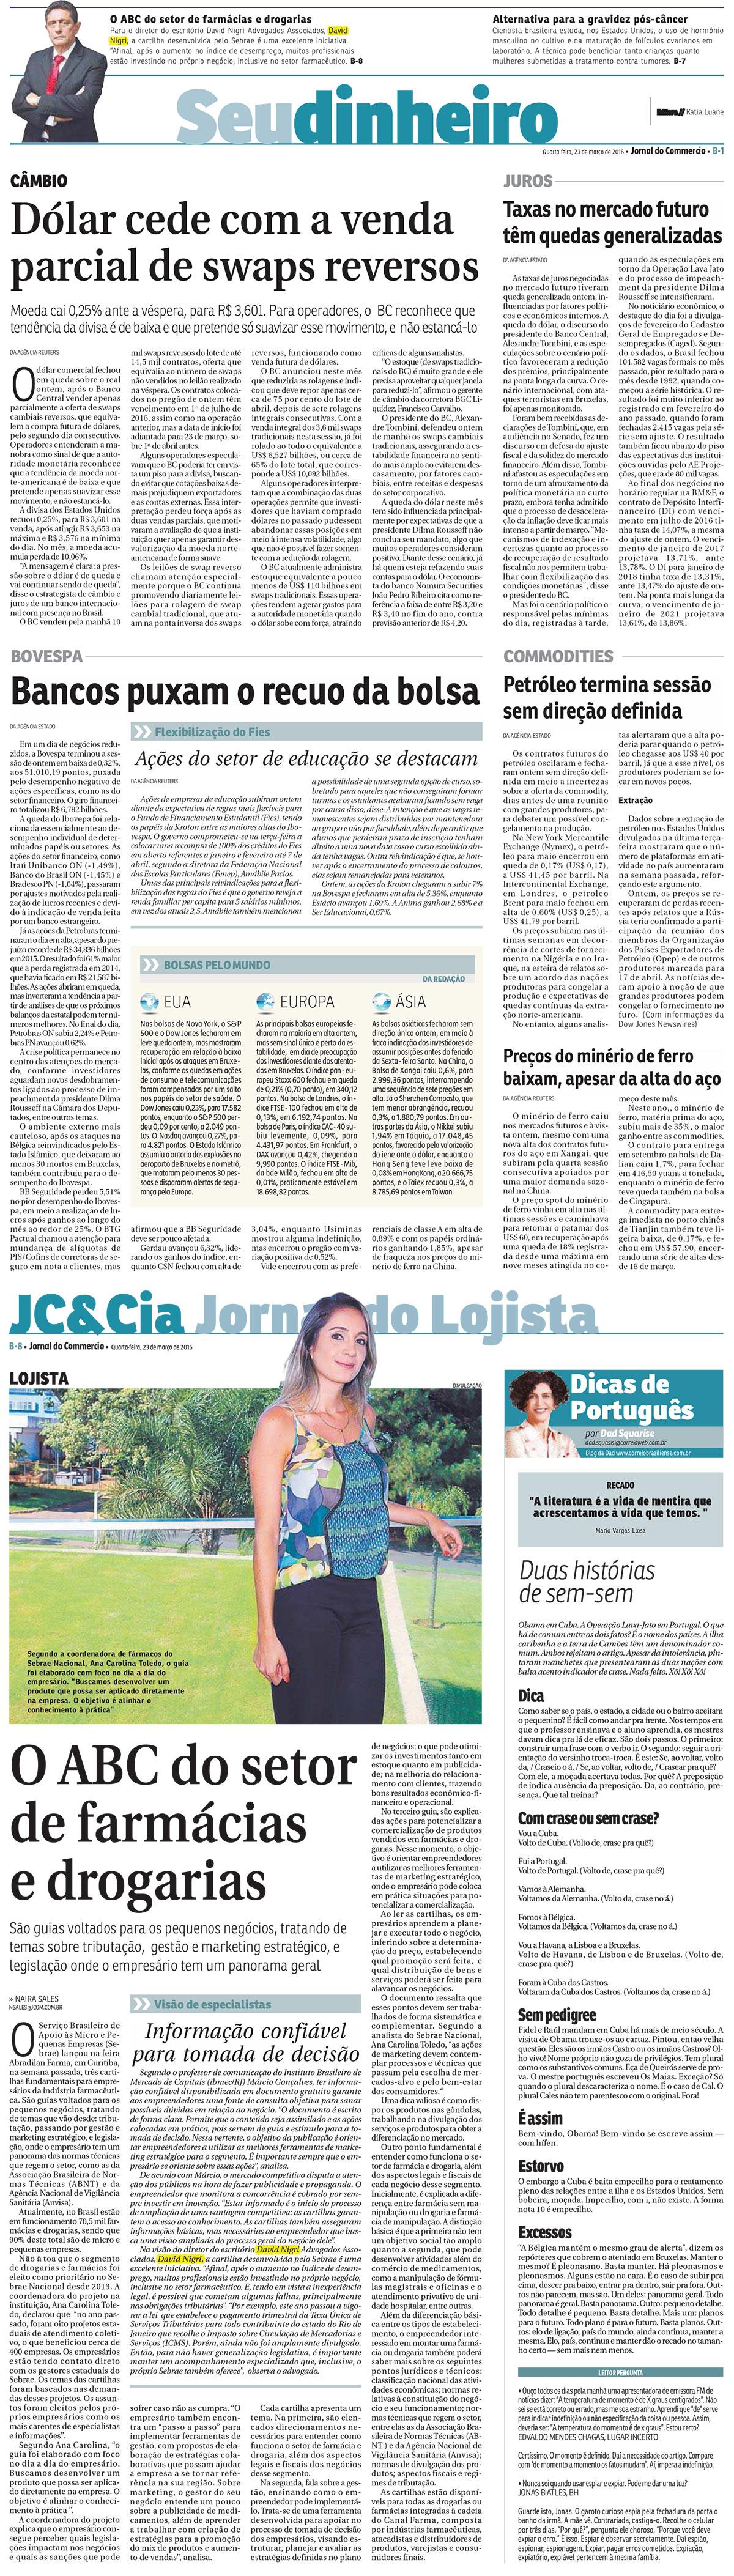 Jornal-do-Commercio-23-03-2016--1